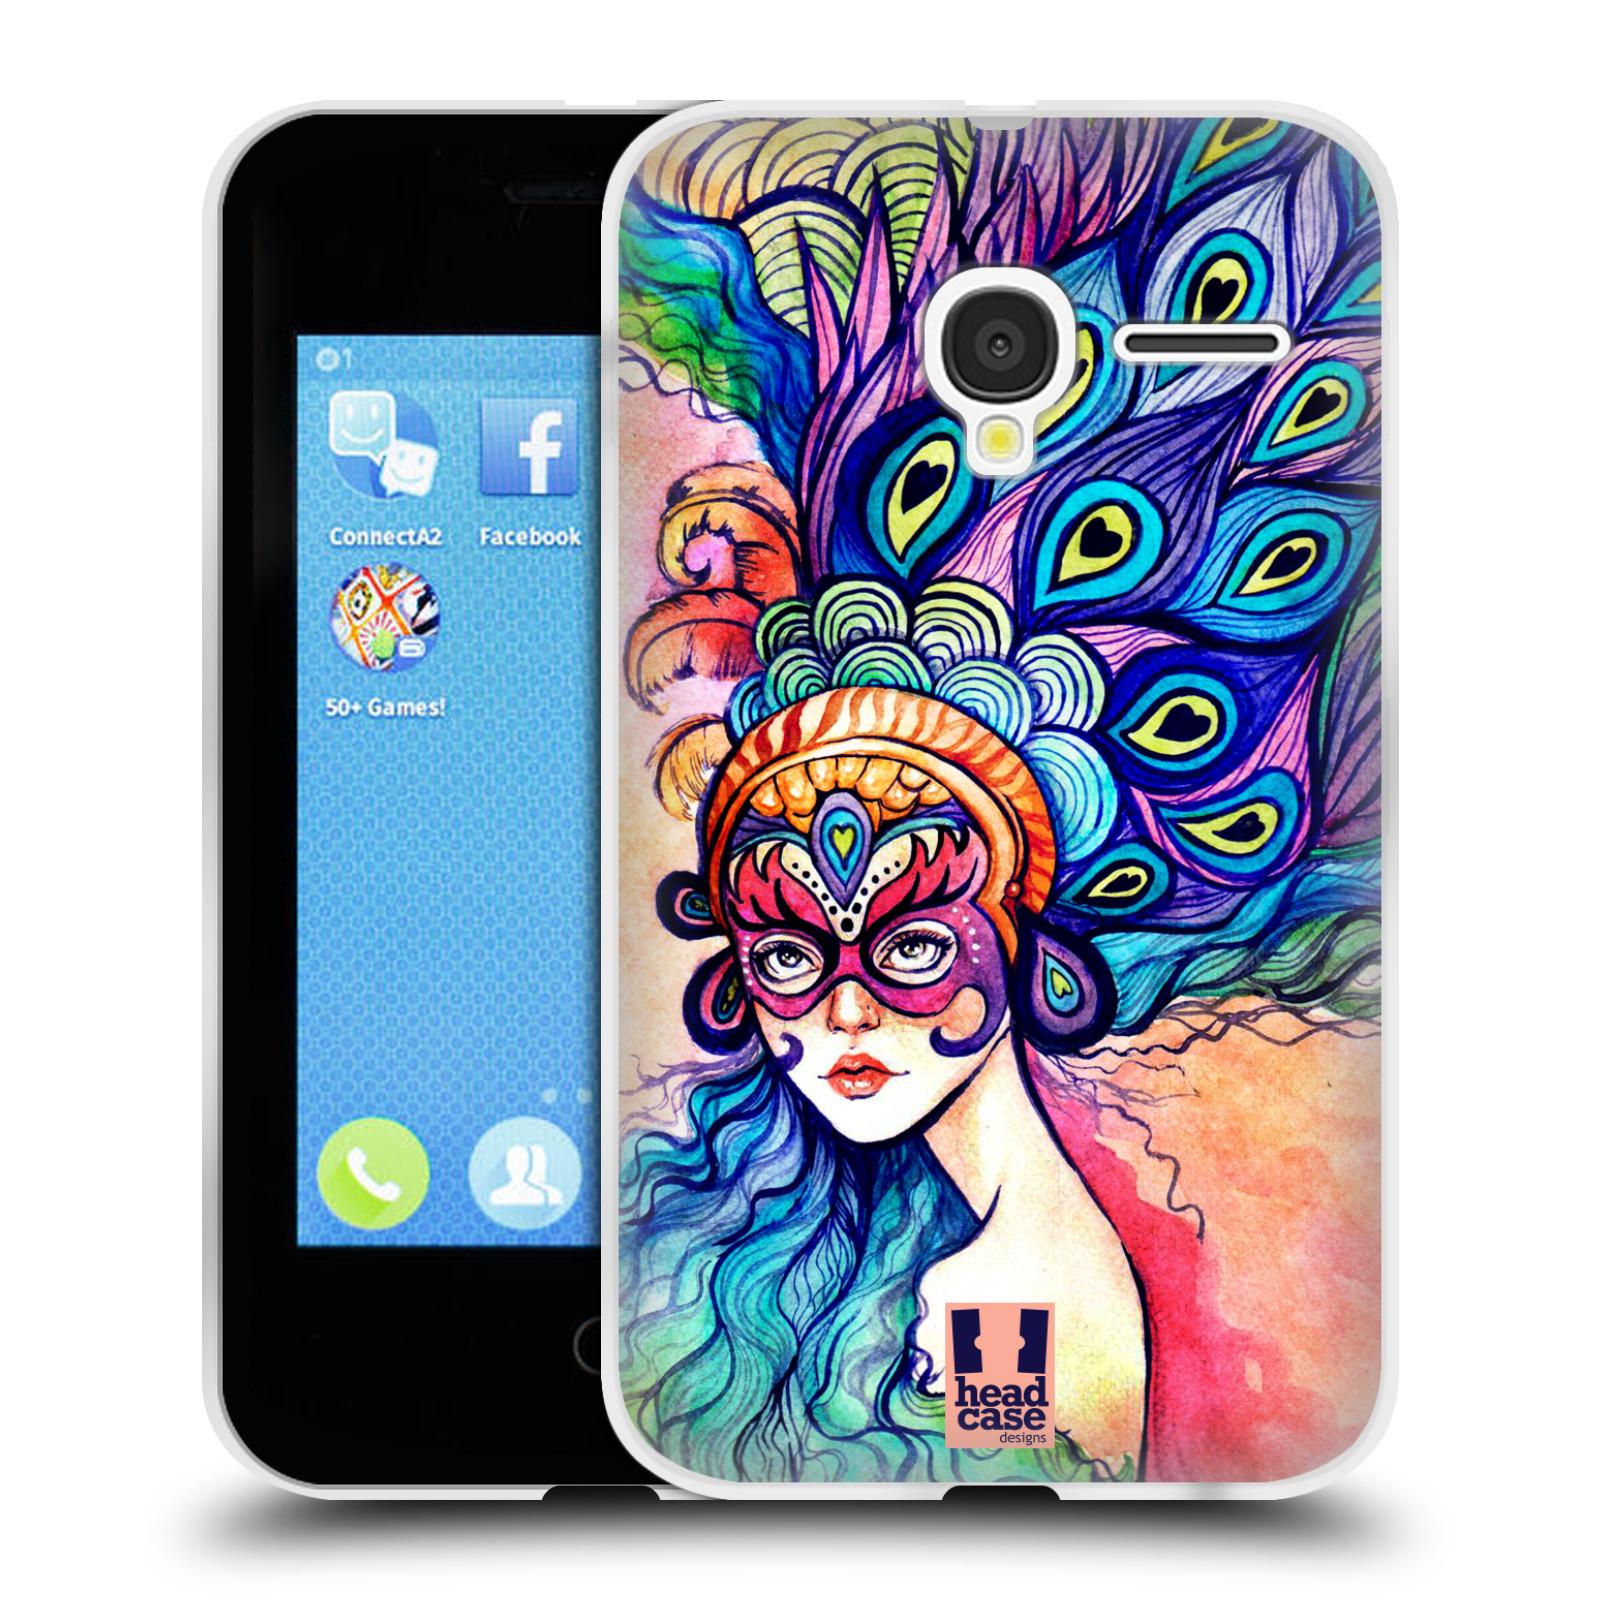 HEAD CASE silikonový obal na mobil Alcatel PIXI 3 OT-4022D (3,5 palcový displej) vzor Maškarní ples masky kreslené vzory MODRÉ PÍRKA